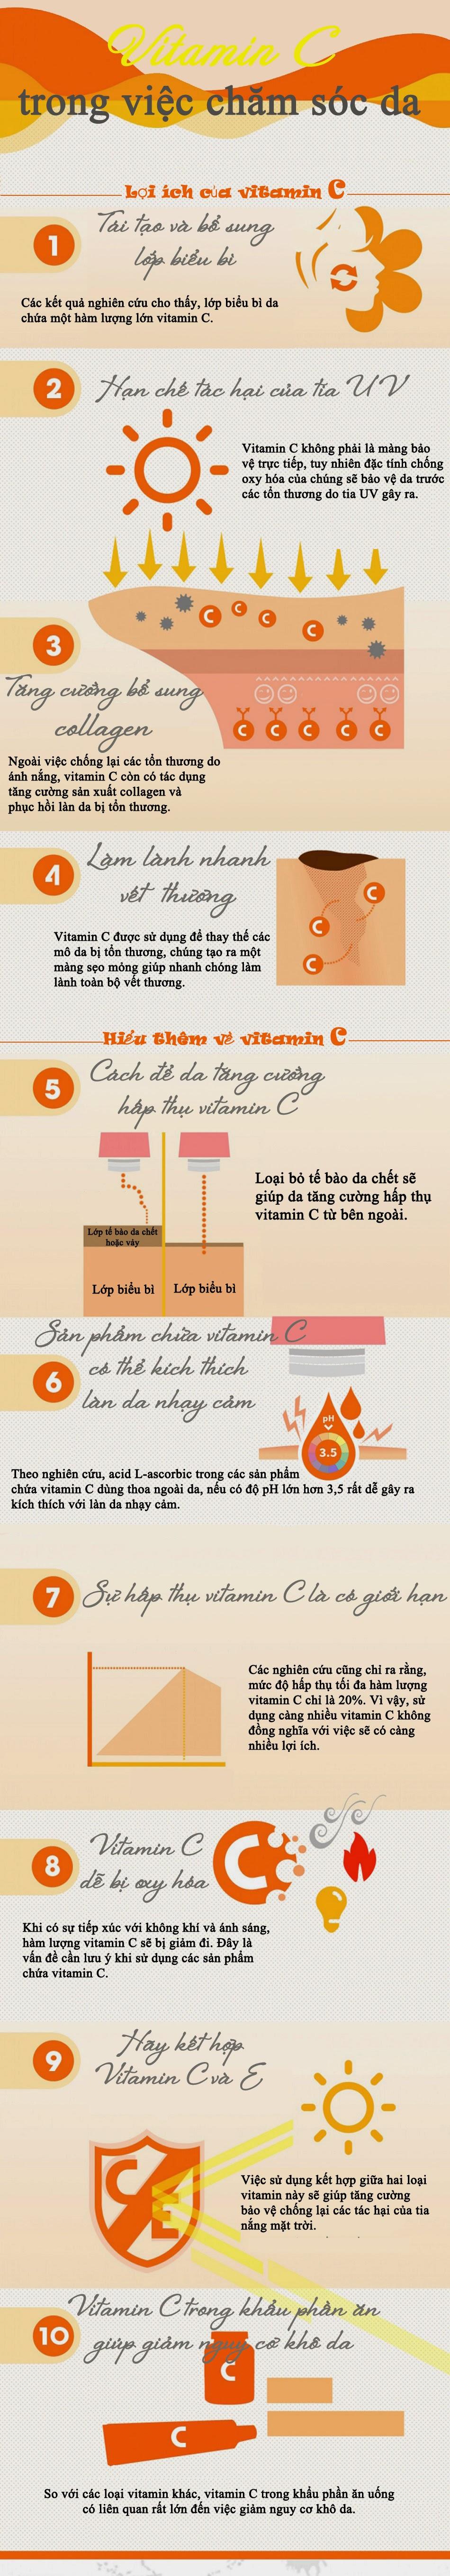 Vitamin C co loi cho da nhu the nao